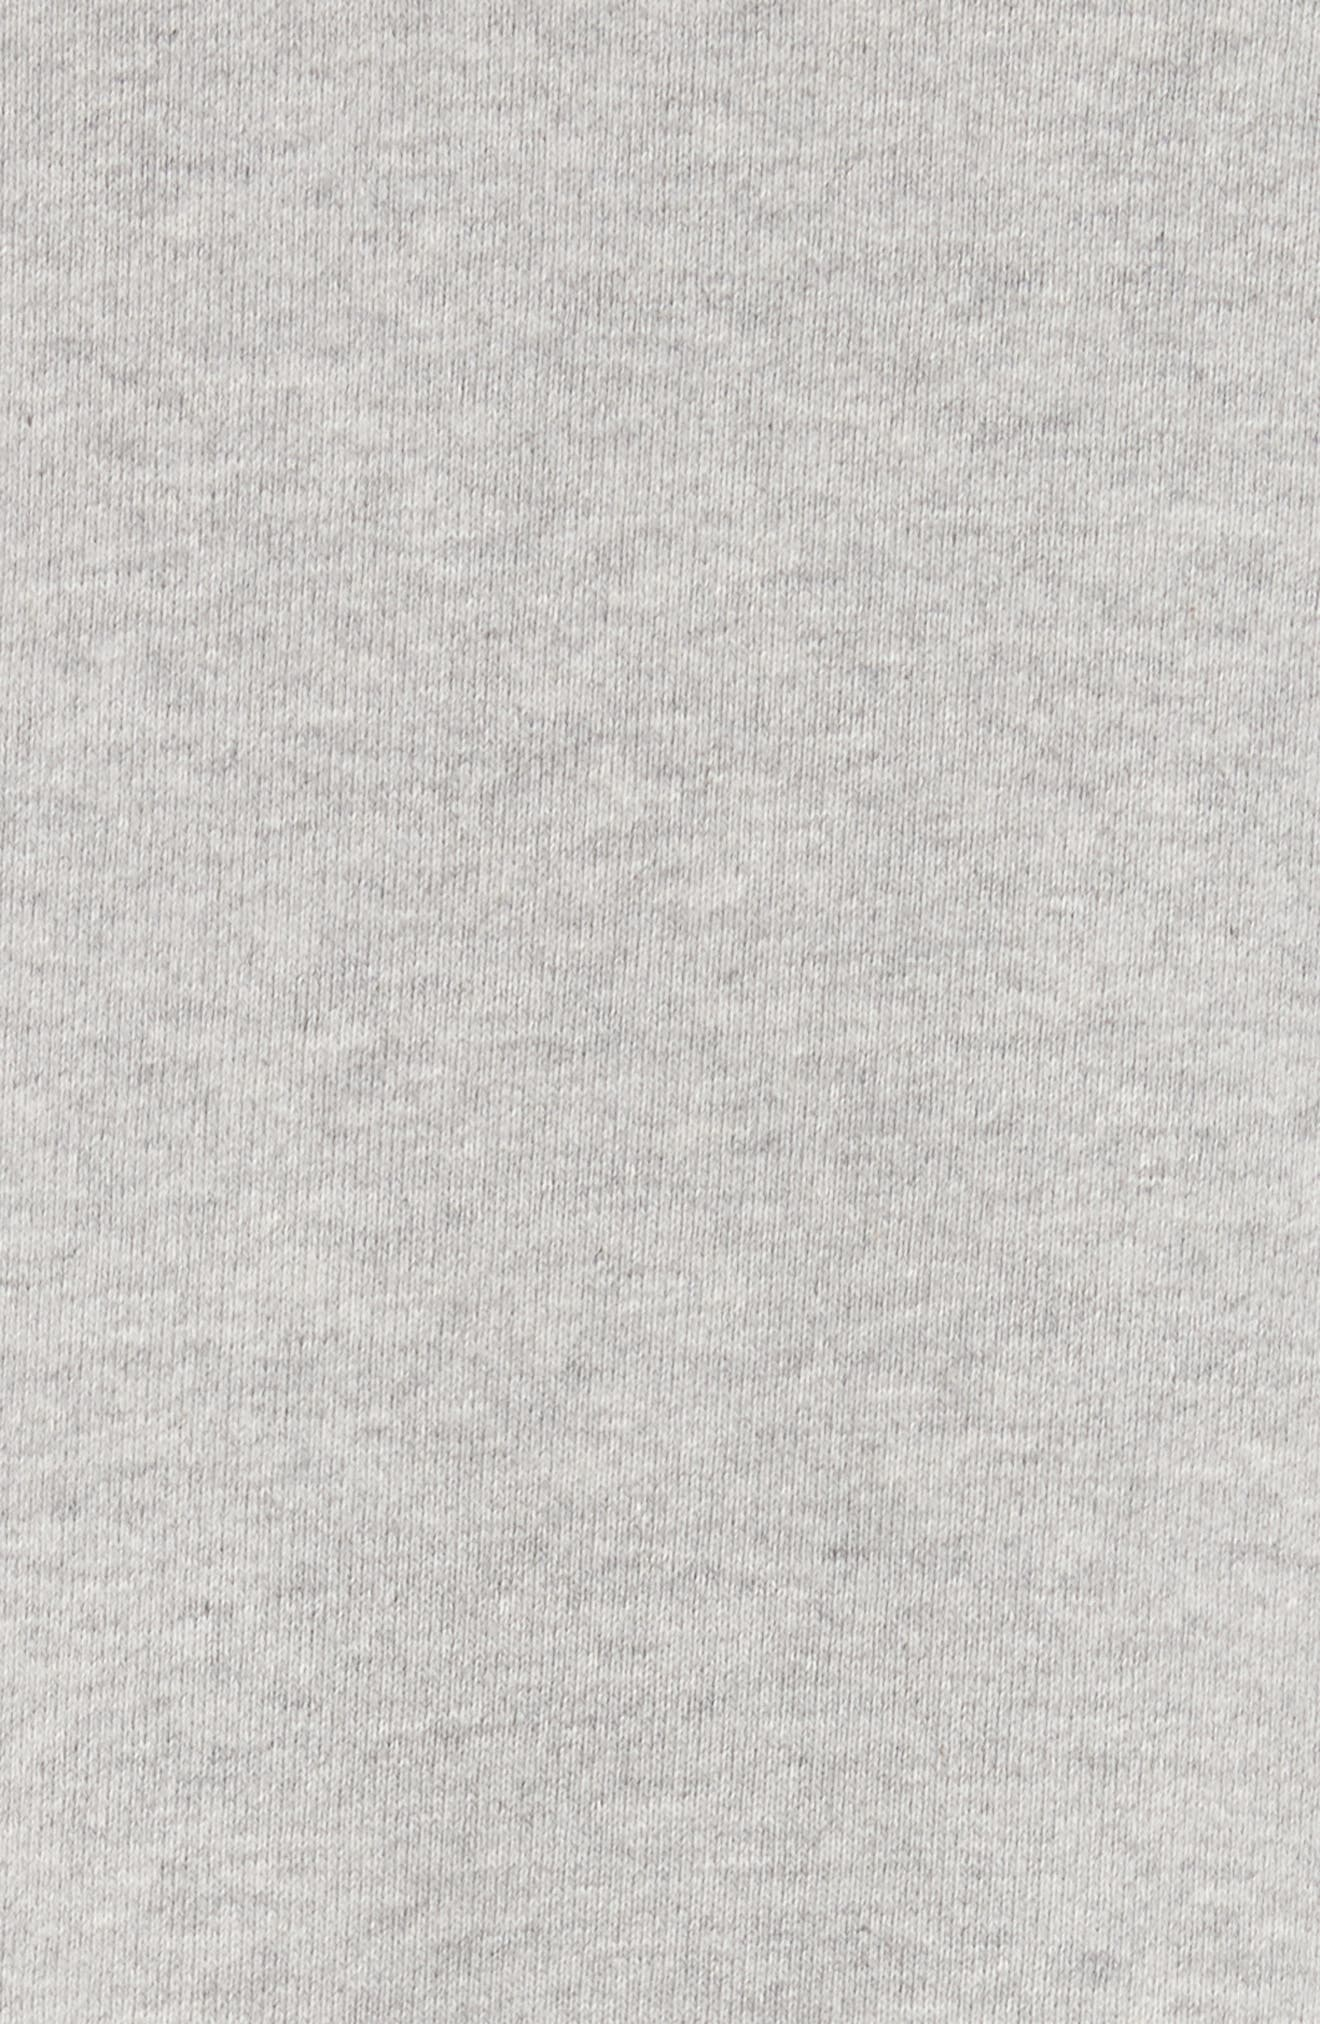 PSWL Graphic Jersey Oversize Sweatshirt,                             Alternate thumbnail 6, color,                             Grey Melange/ White Logo